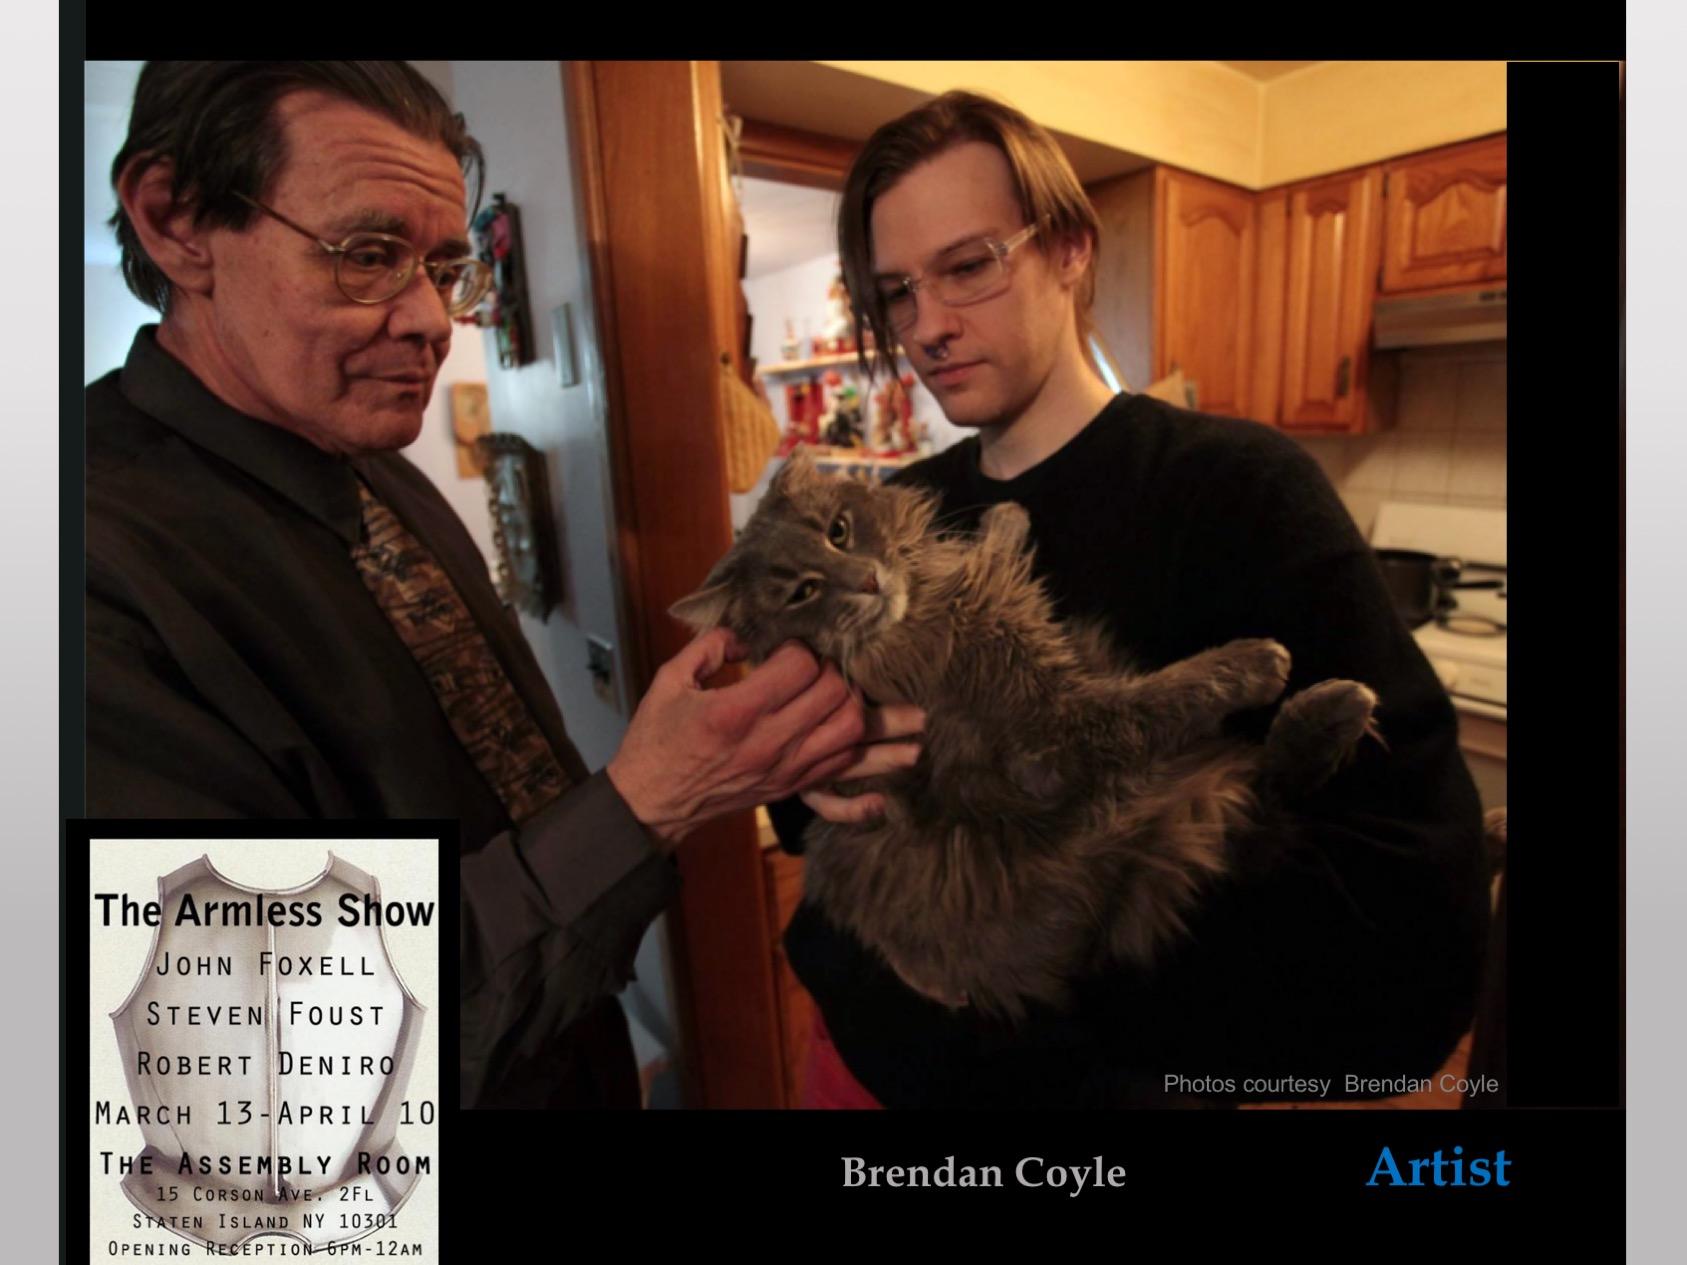 Brendan Coyle gave John a show.